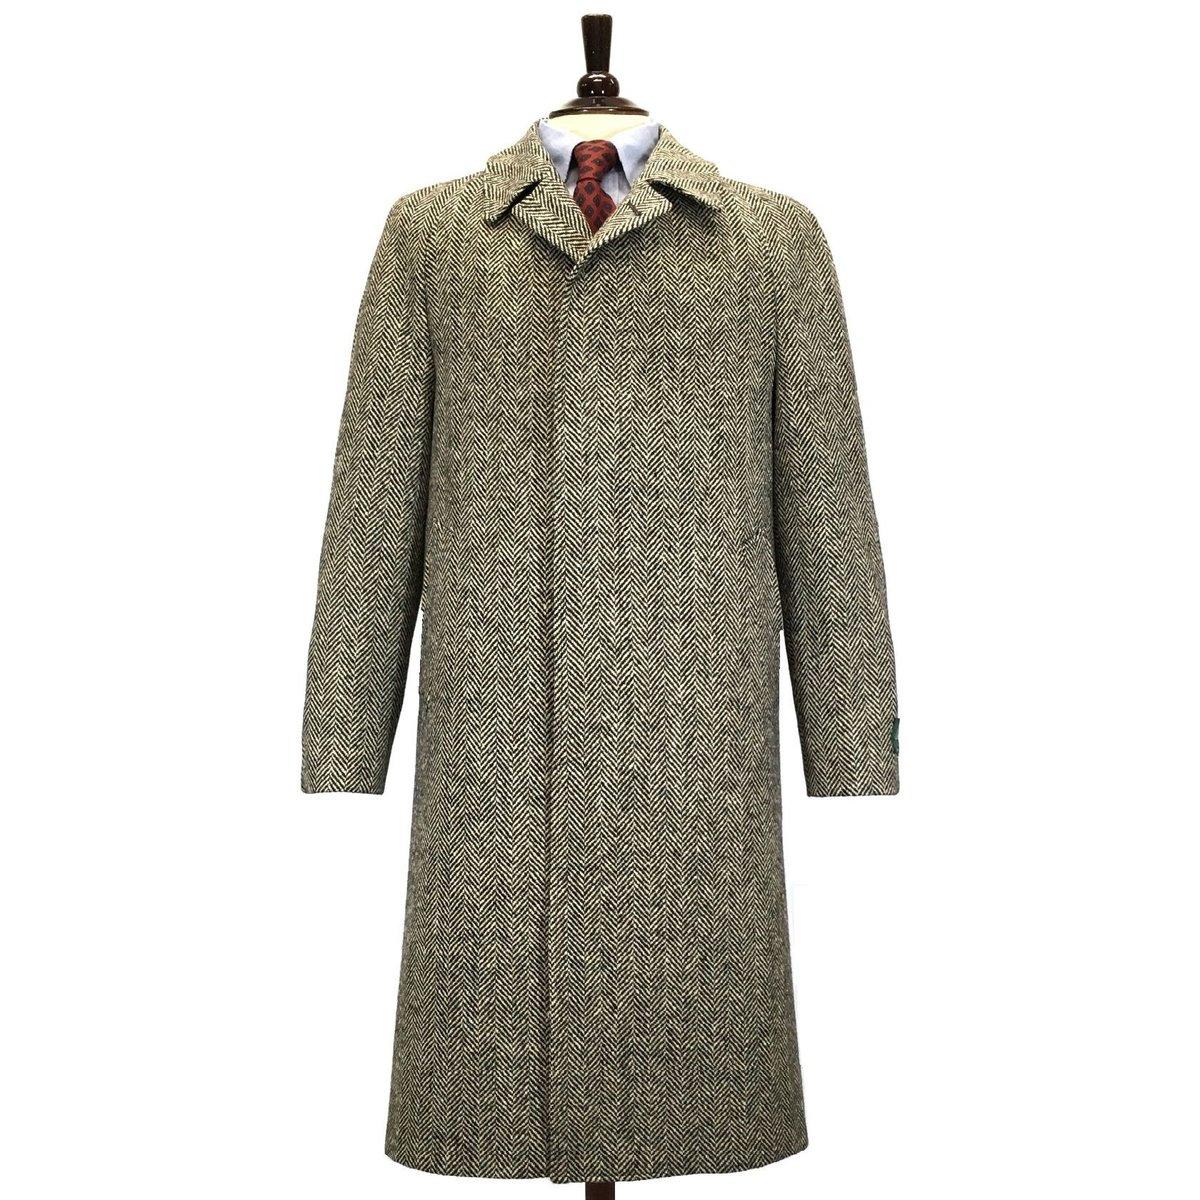 oconnells-raglan-overcoat-magee-tweed-charcoal-oat-herringbone-ocon10008774-sb-raglan_1.jpg